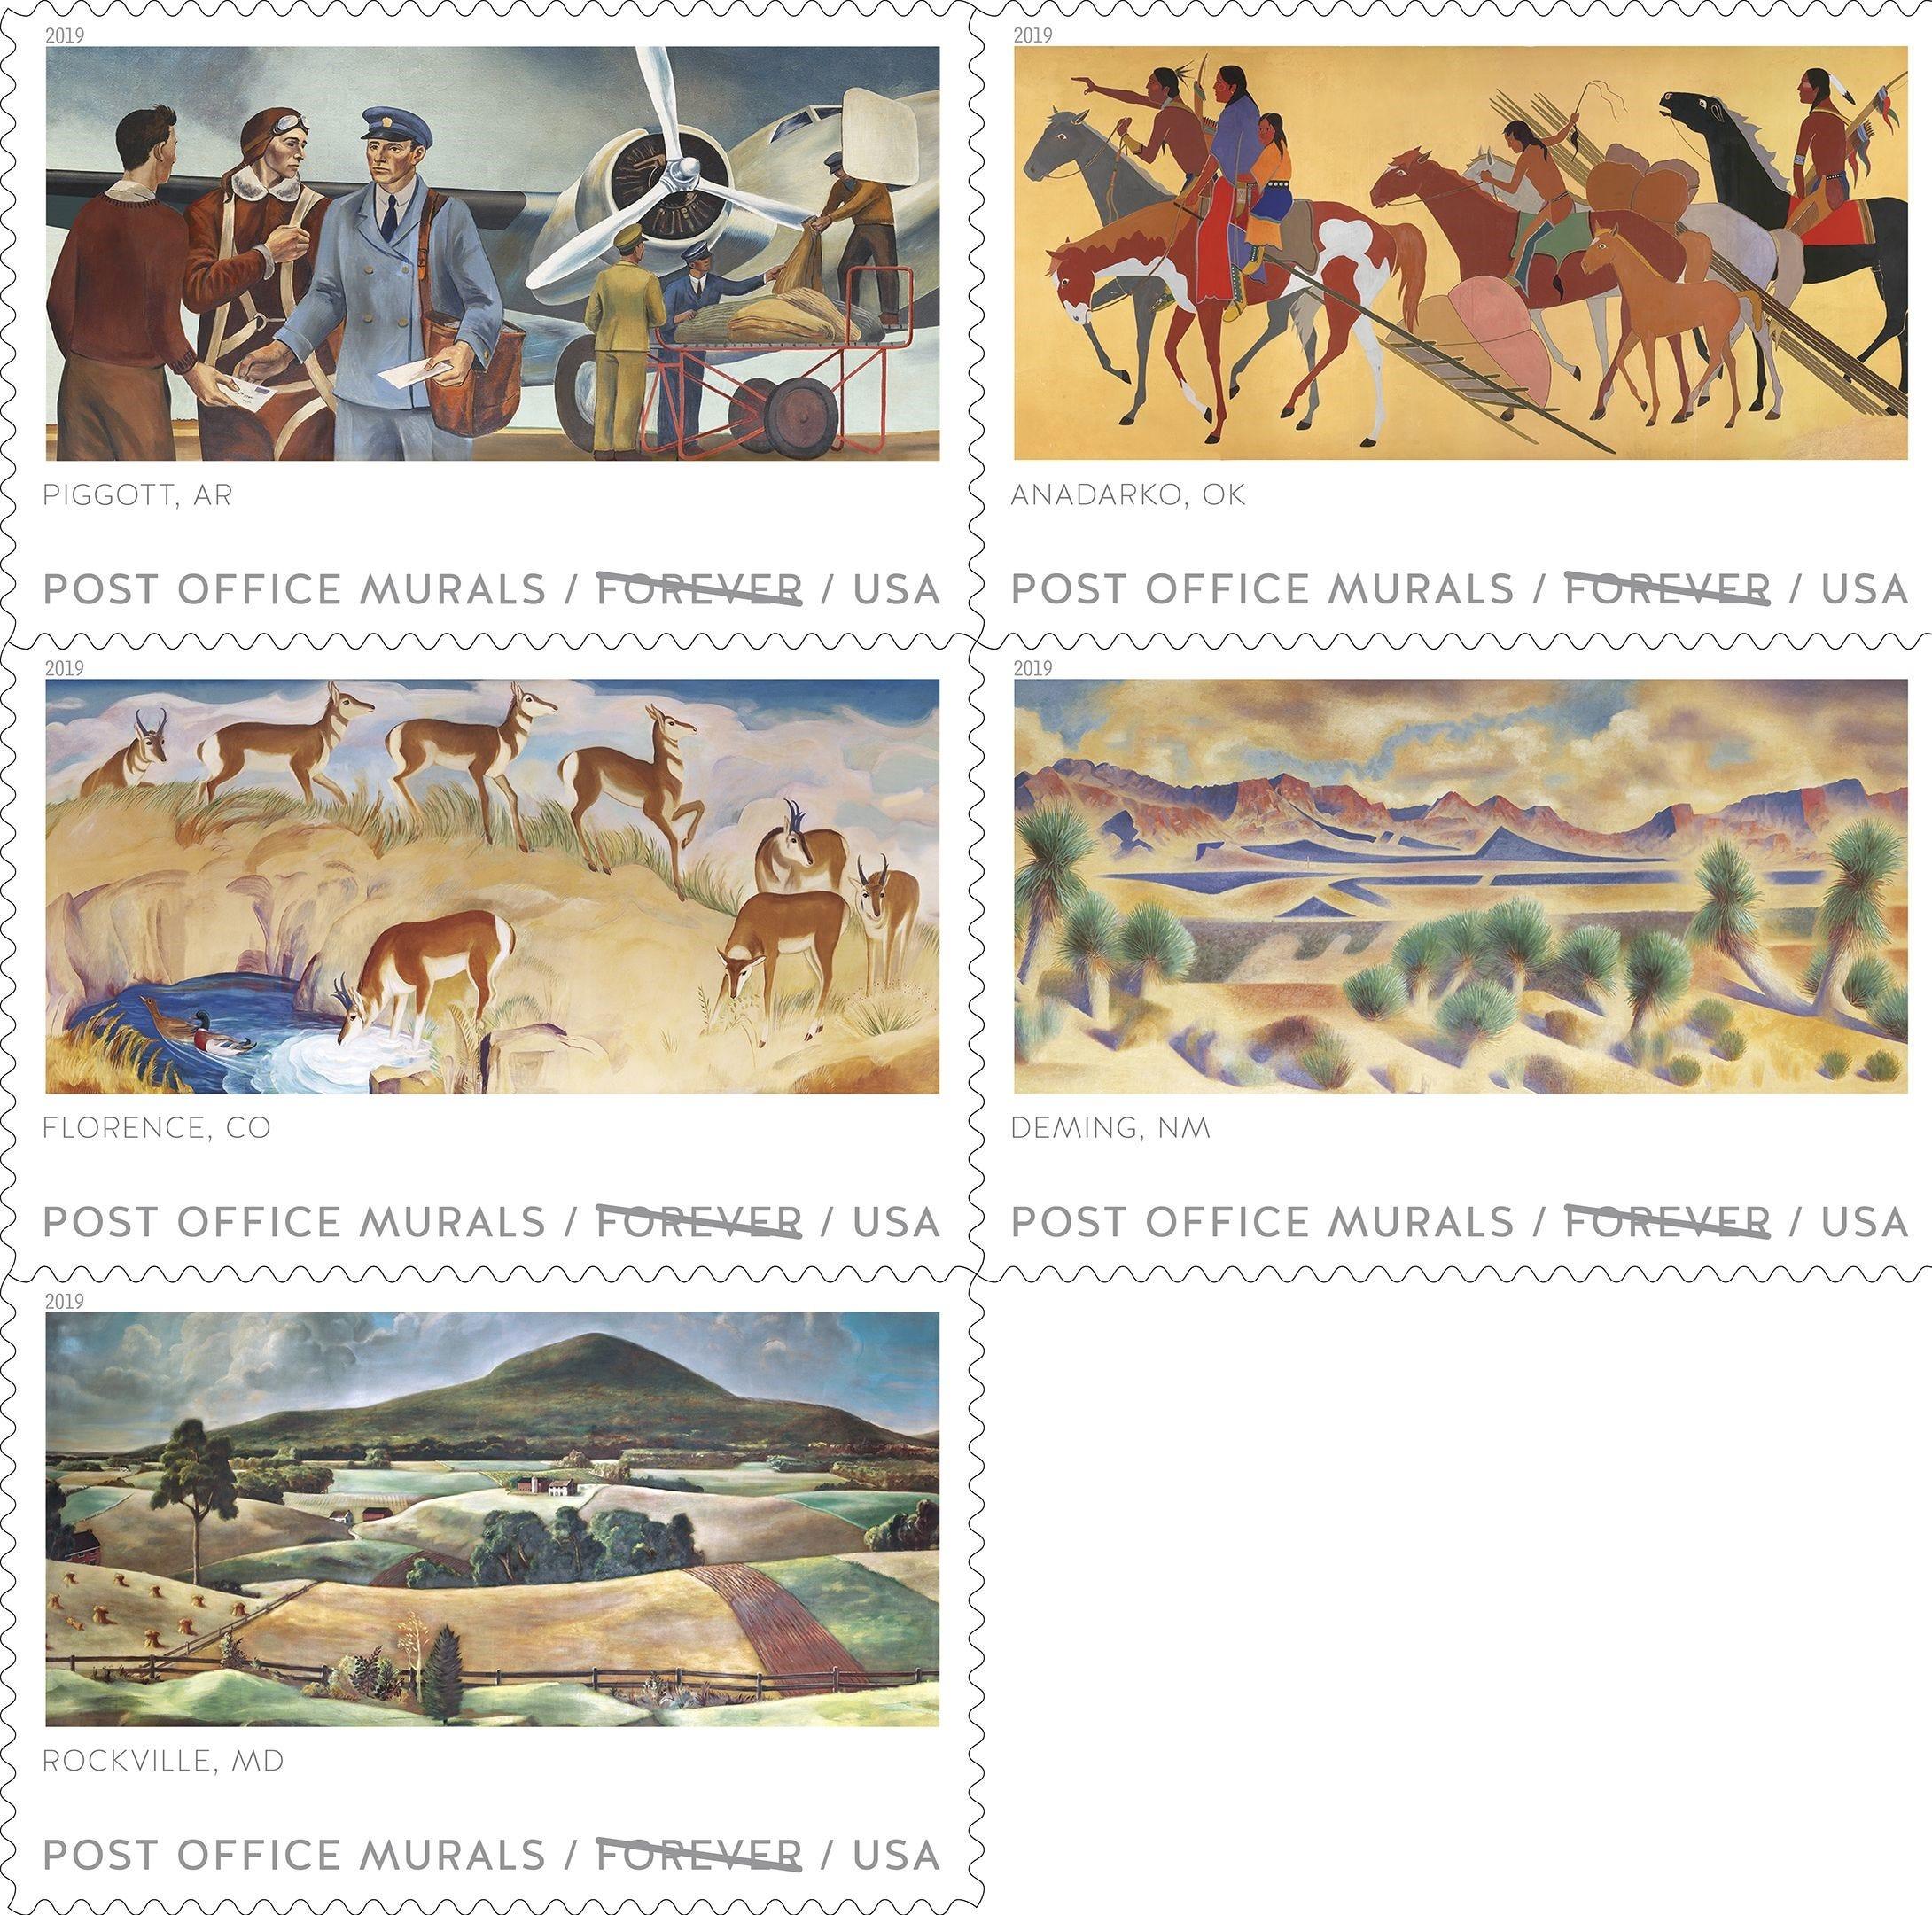 U.S. Post Office unveils Depression-era murals on commemorative stamps